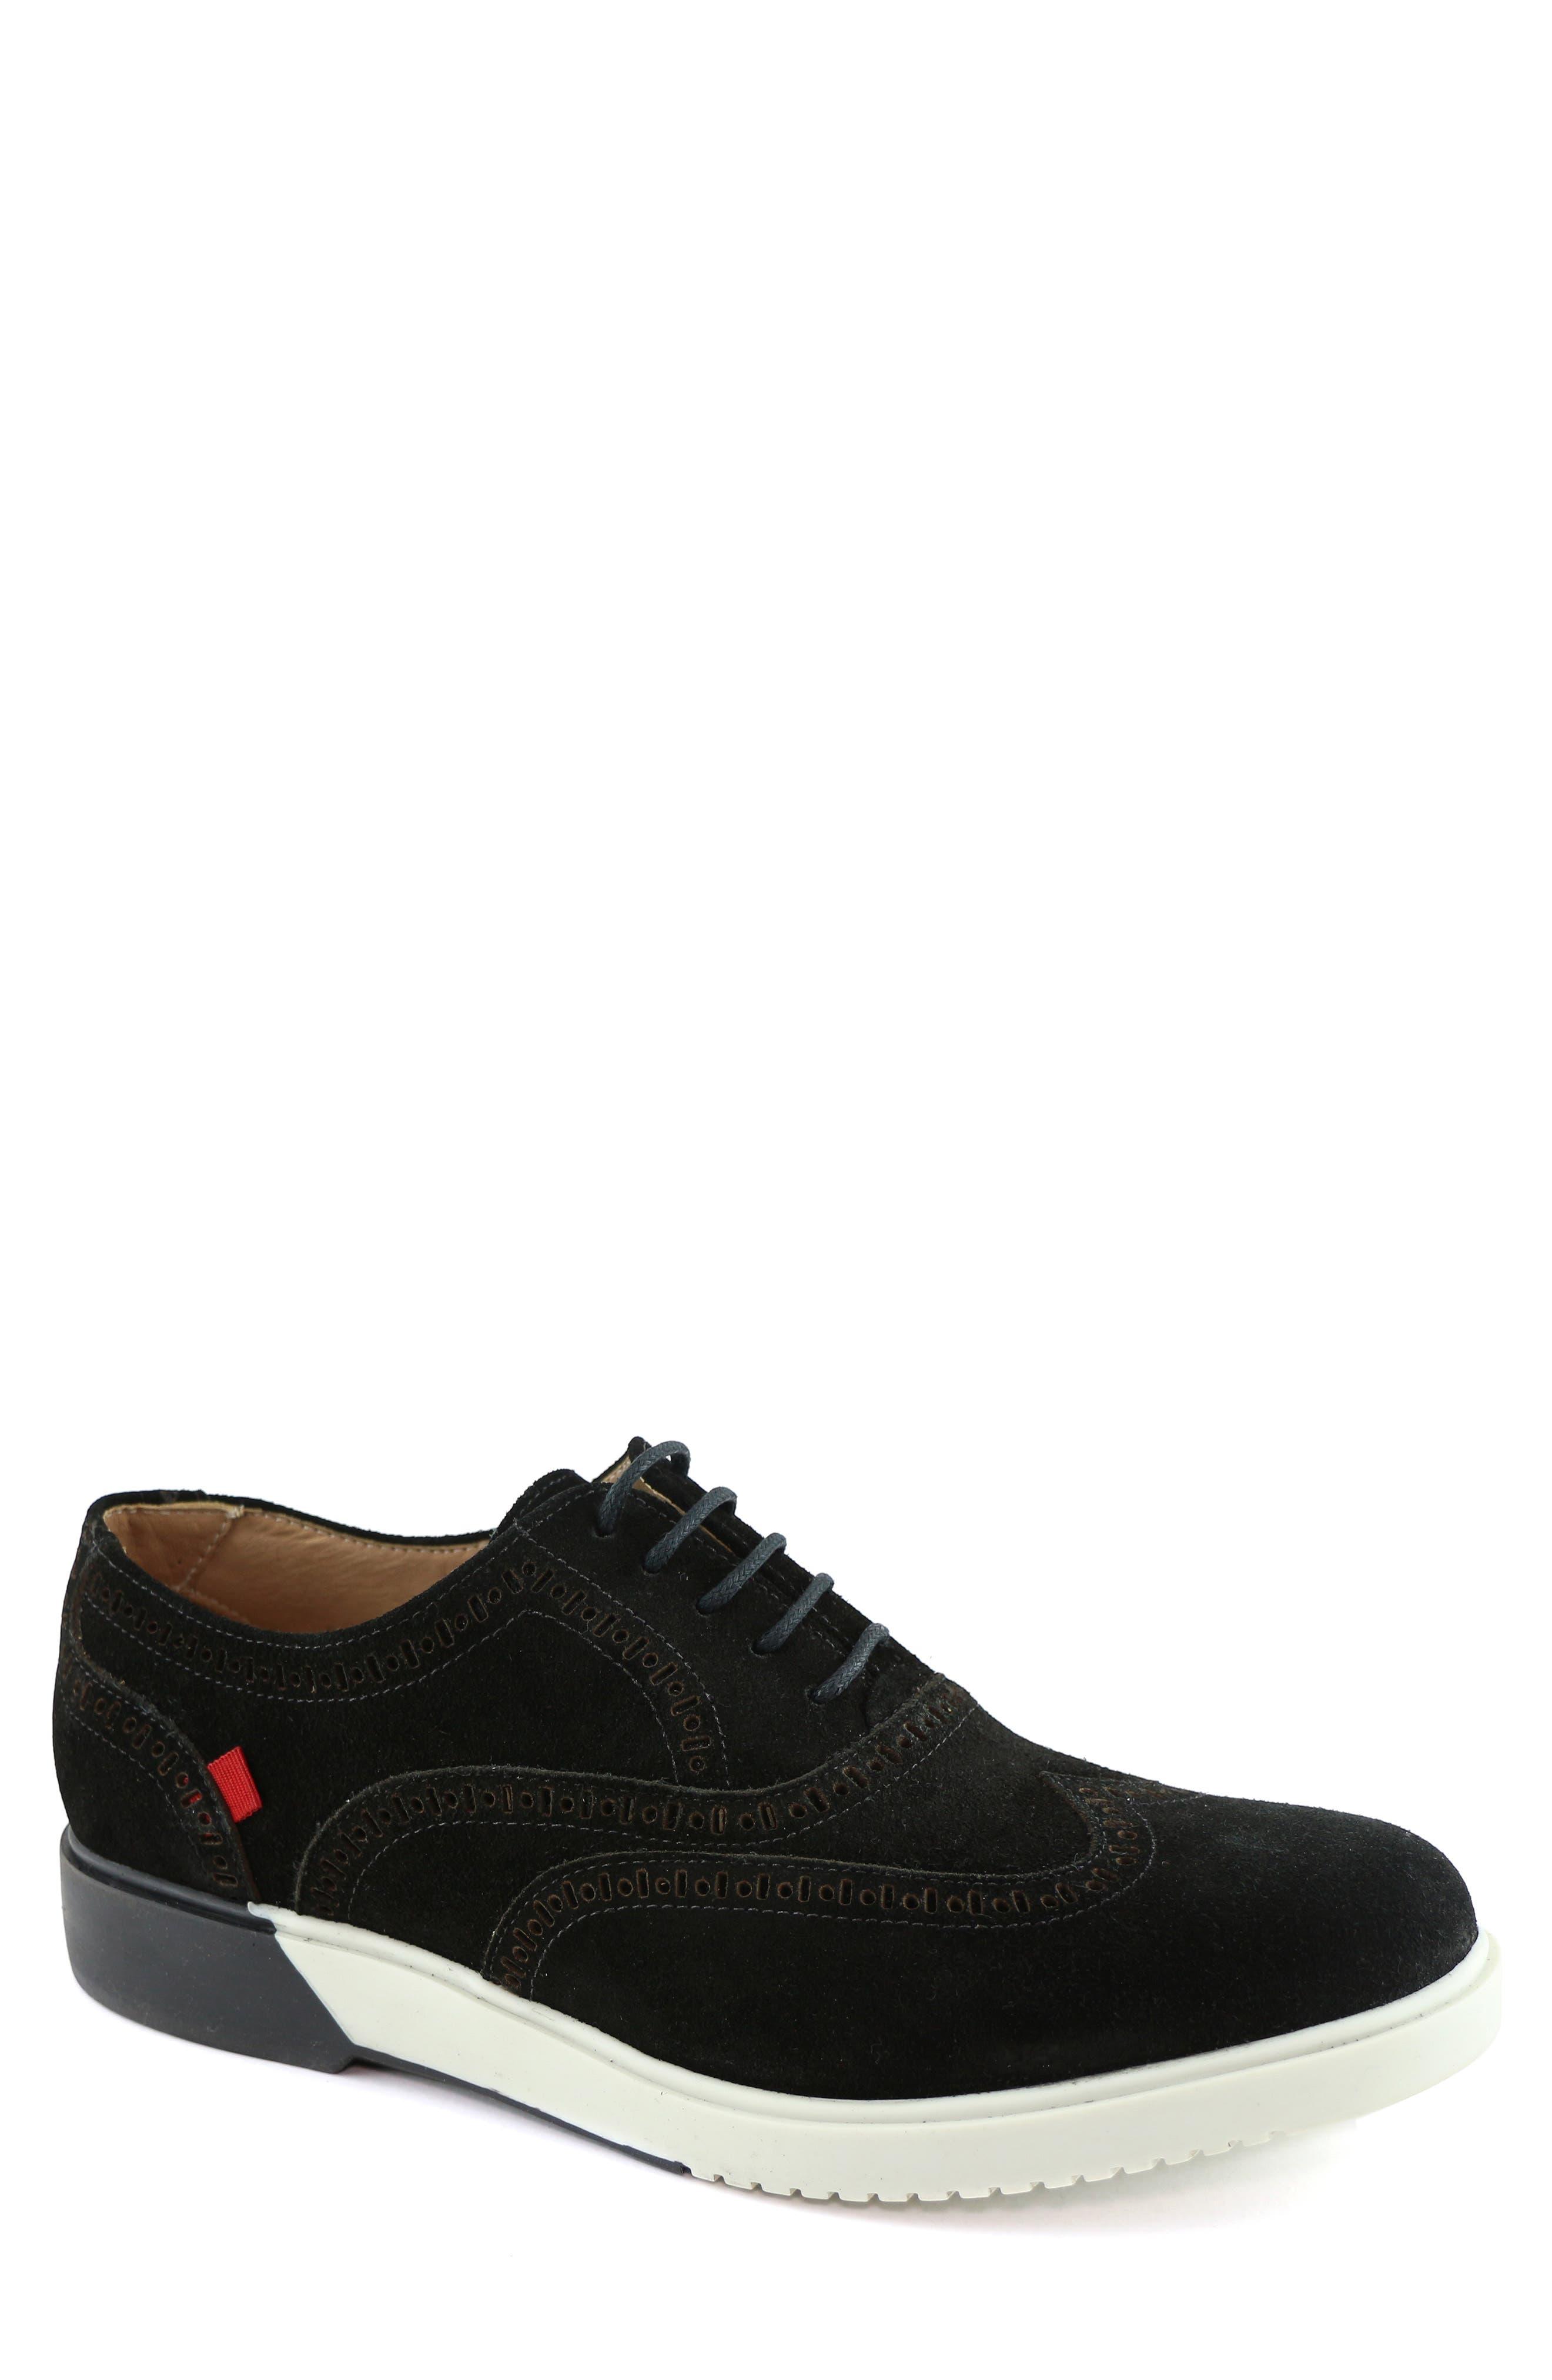 Marc Joseph New York 5Th Ave Wingtip Sneaker